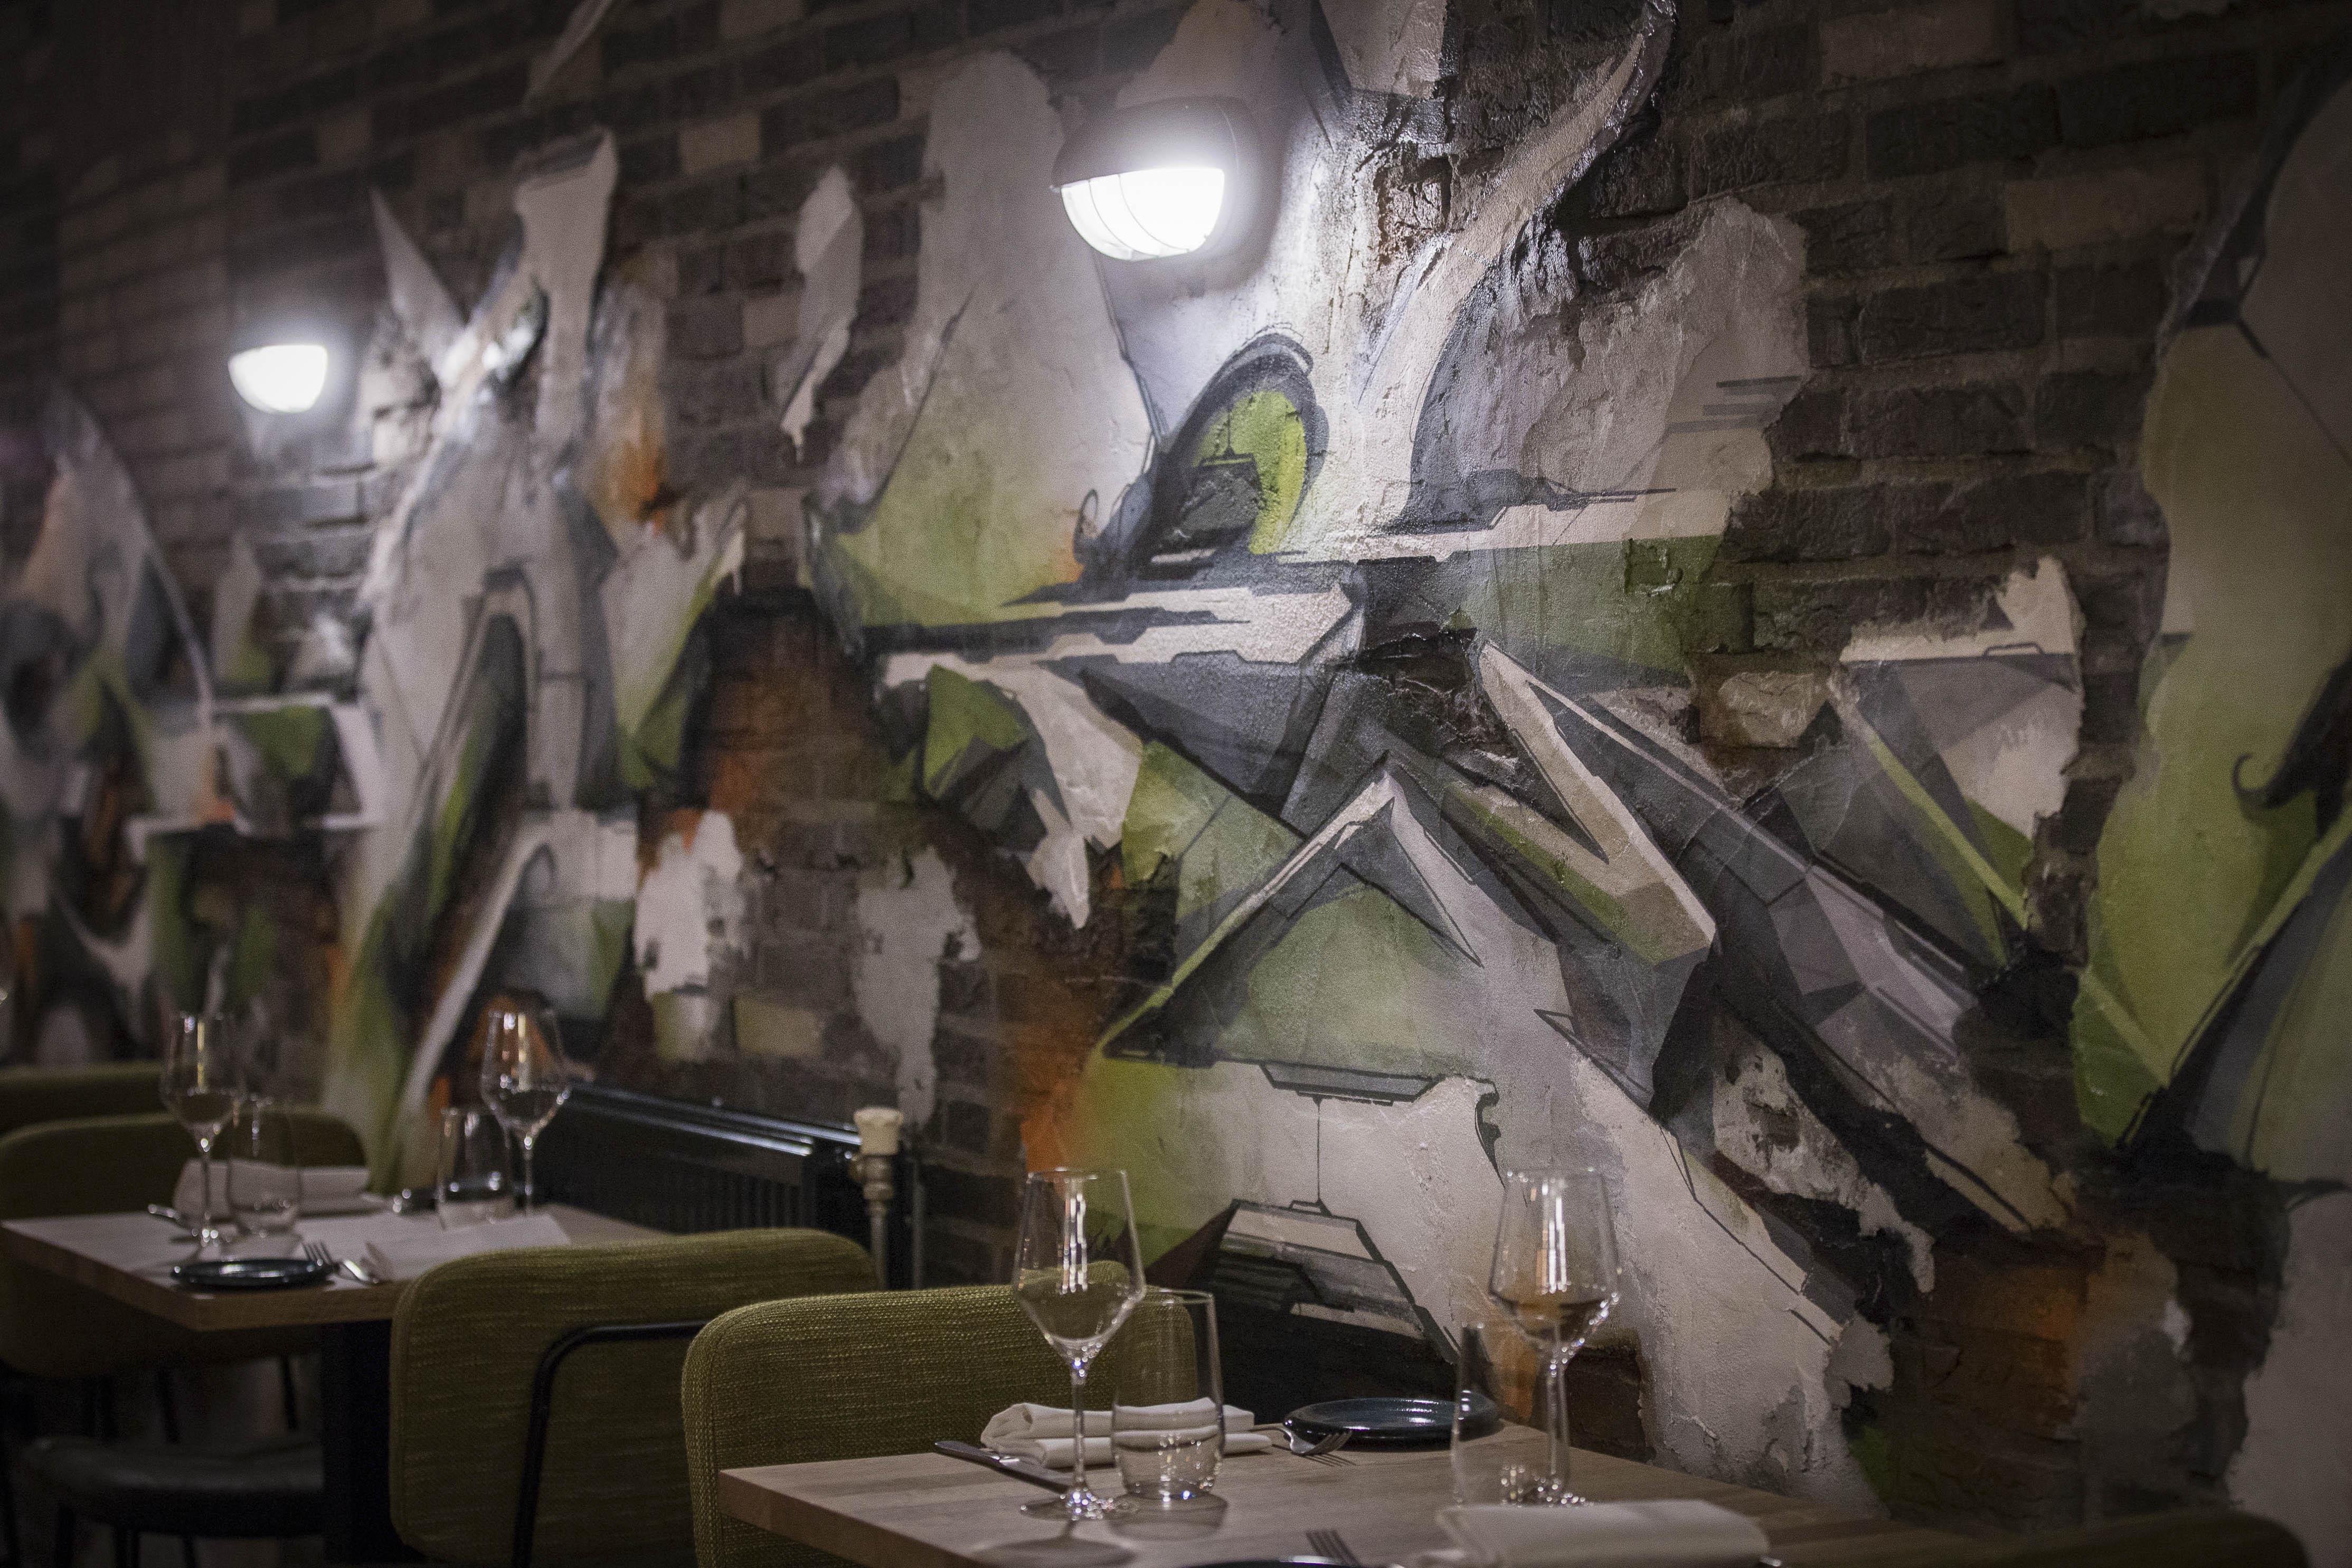 A work by Does - 8 Digital Does Zinc Restaurant_Blickfänger02-smaller